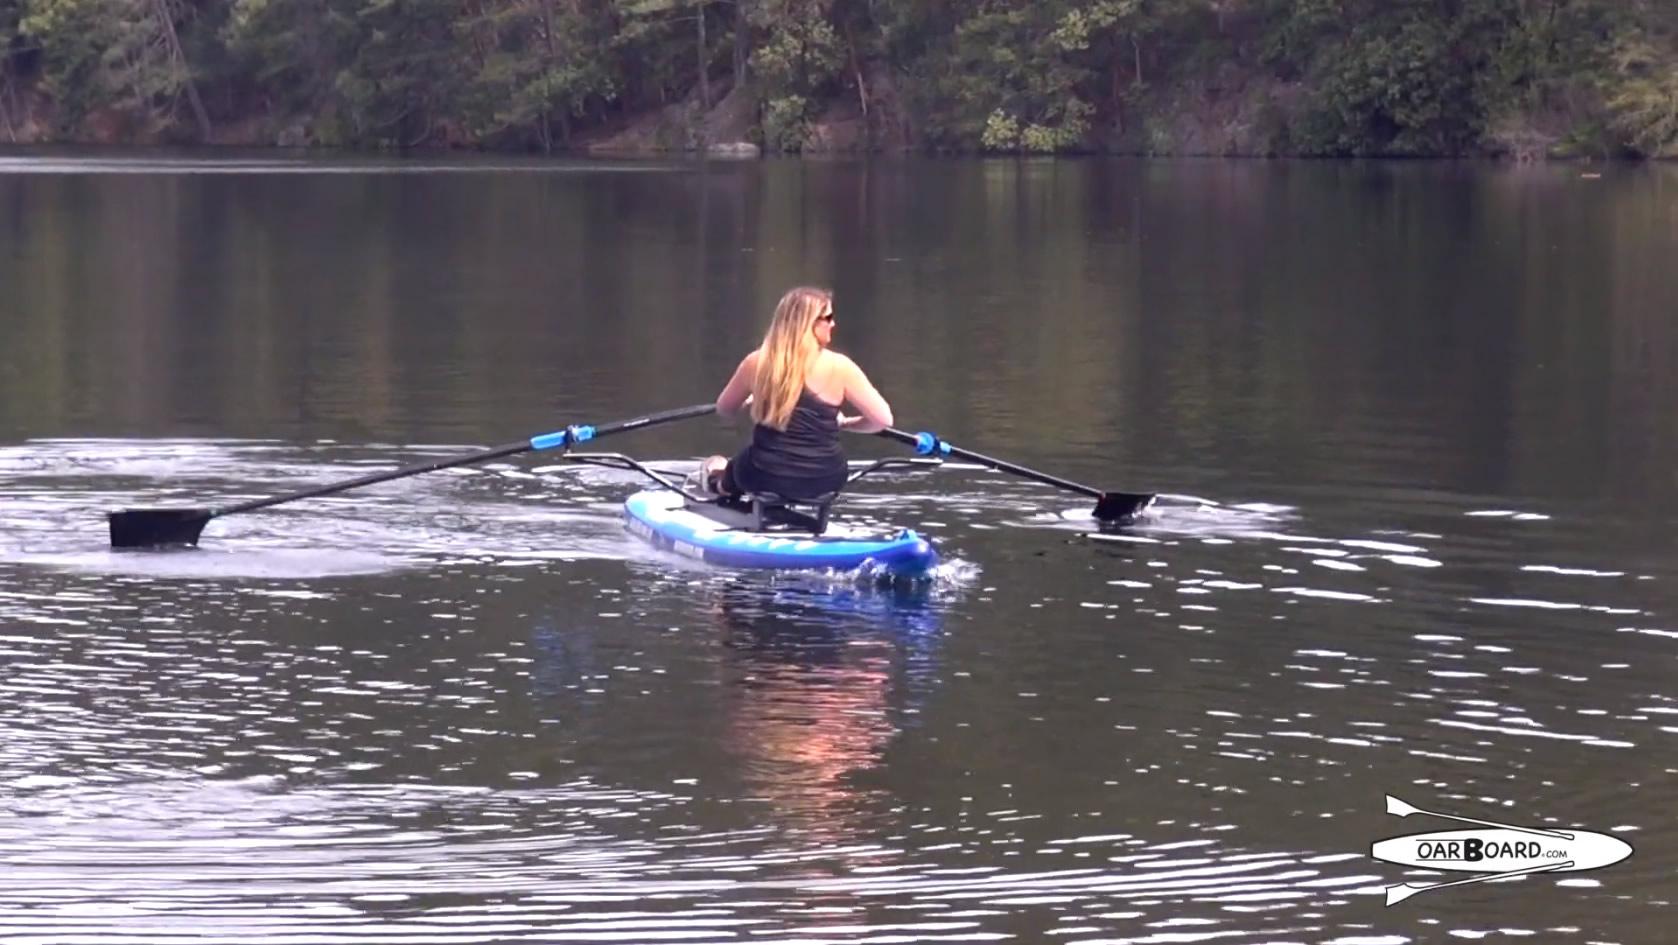 Oar-Board-SUP-Fit-On-Top-Rower-video-withDiana-Lesieur-2